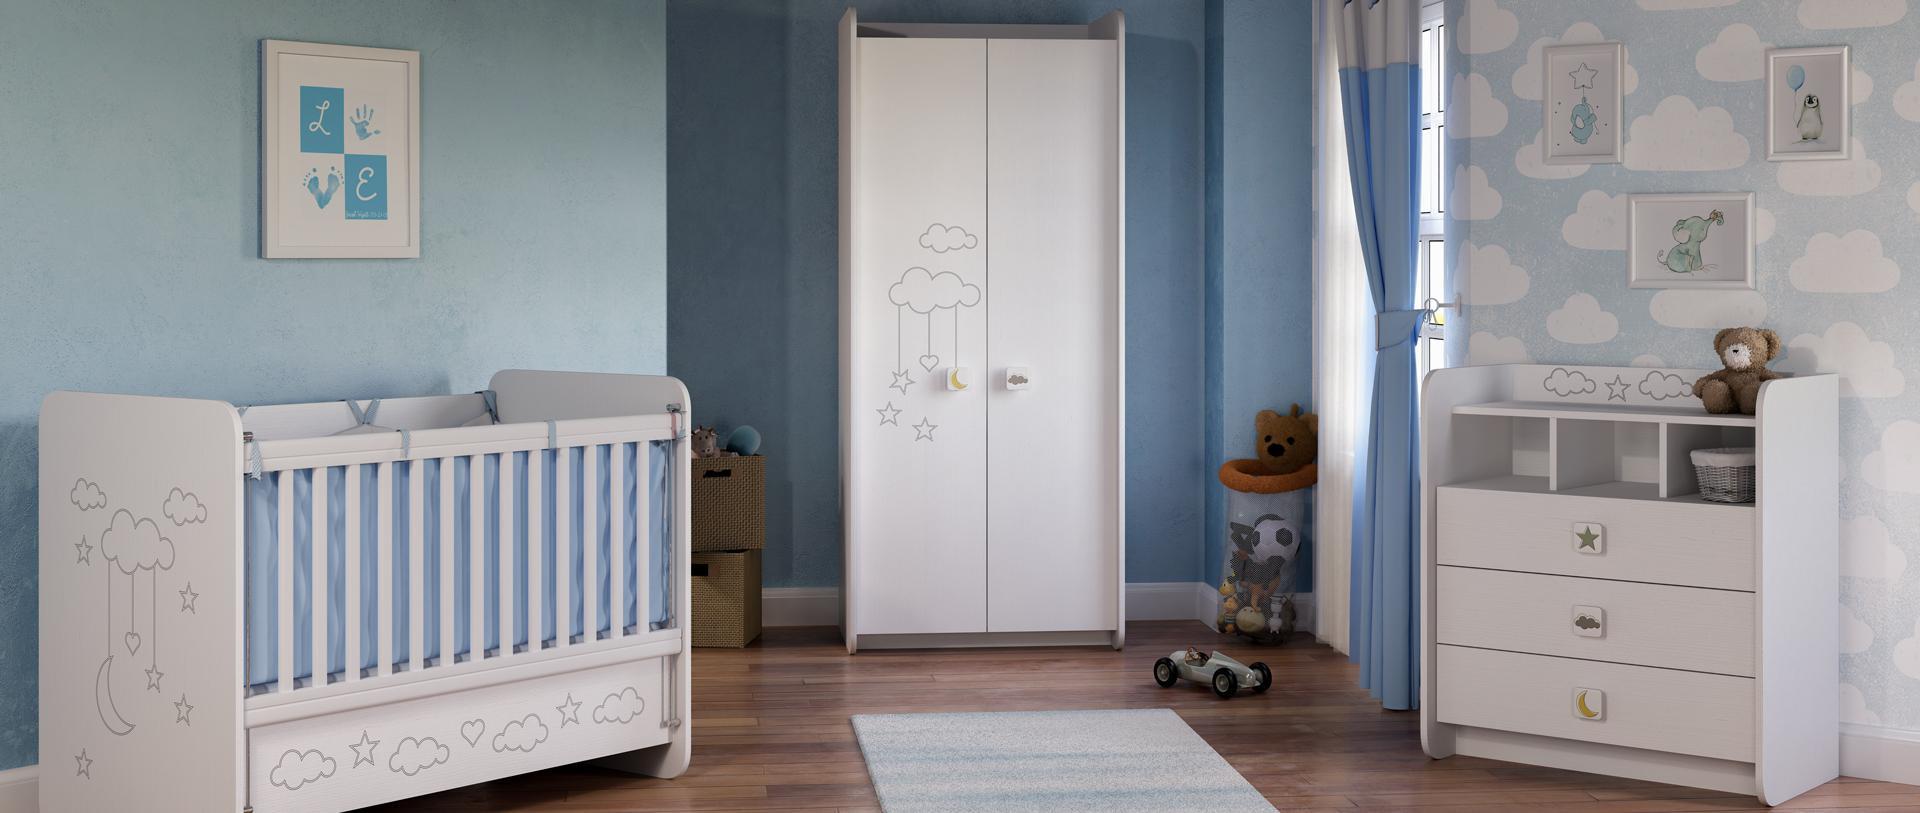 ALFEMO KIDS&TEENS VIA BABY ROOM